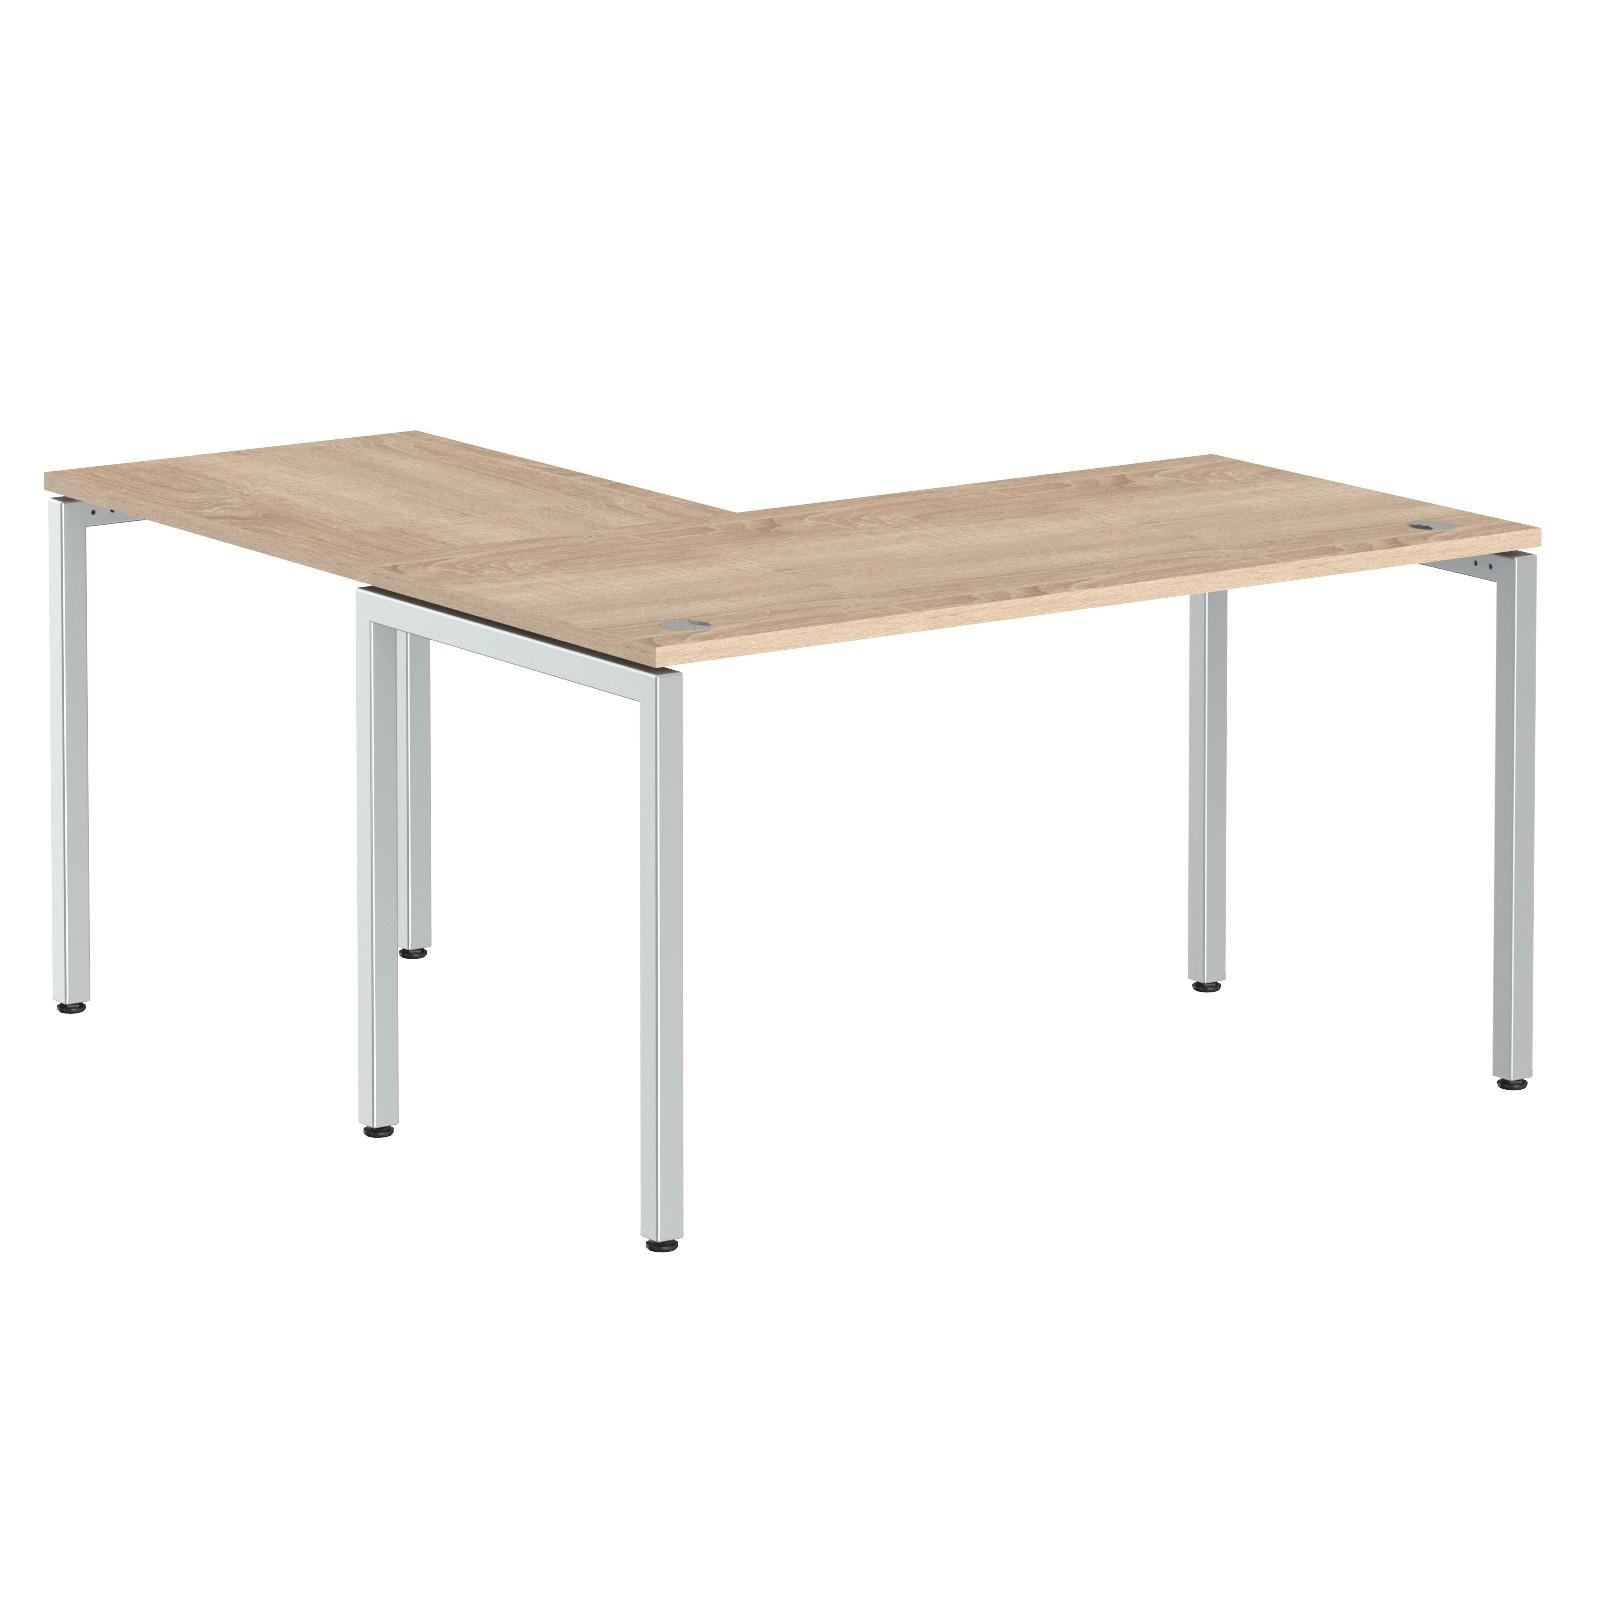 Стол угловой XTEN-S XSCT 1415